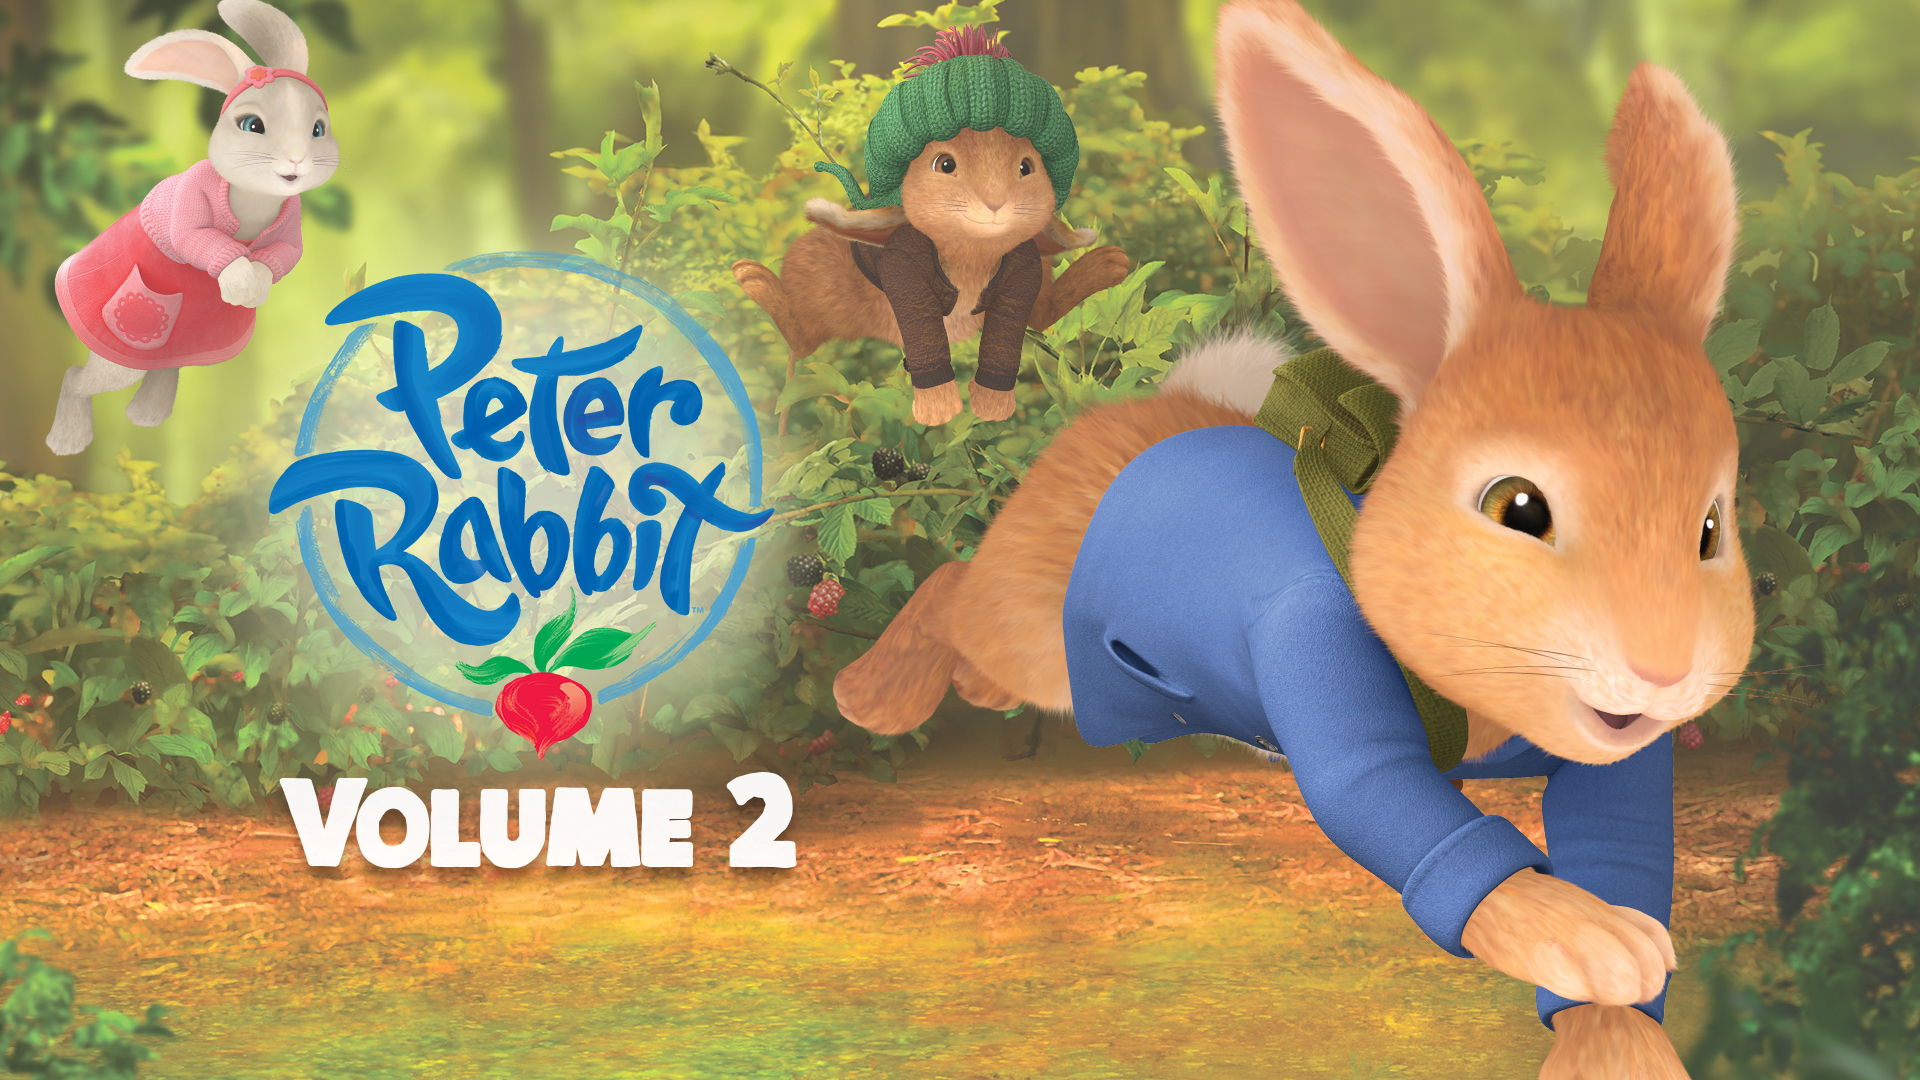 Peter Rabbit Volume 2